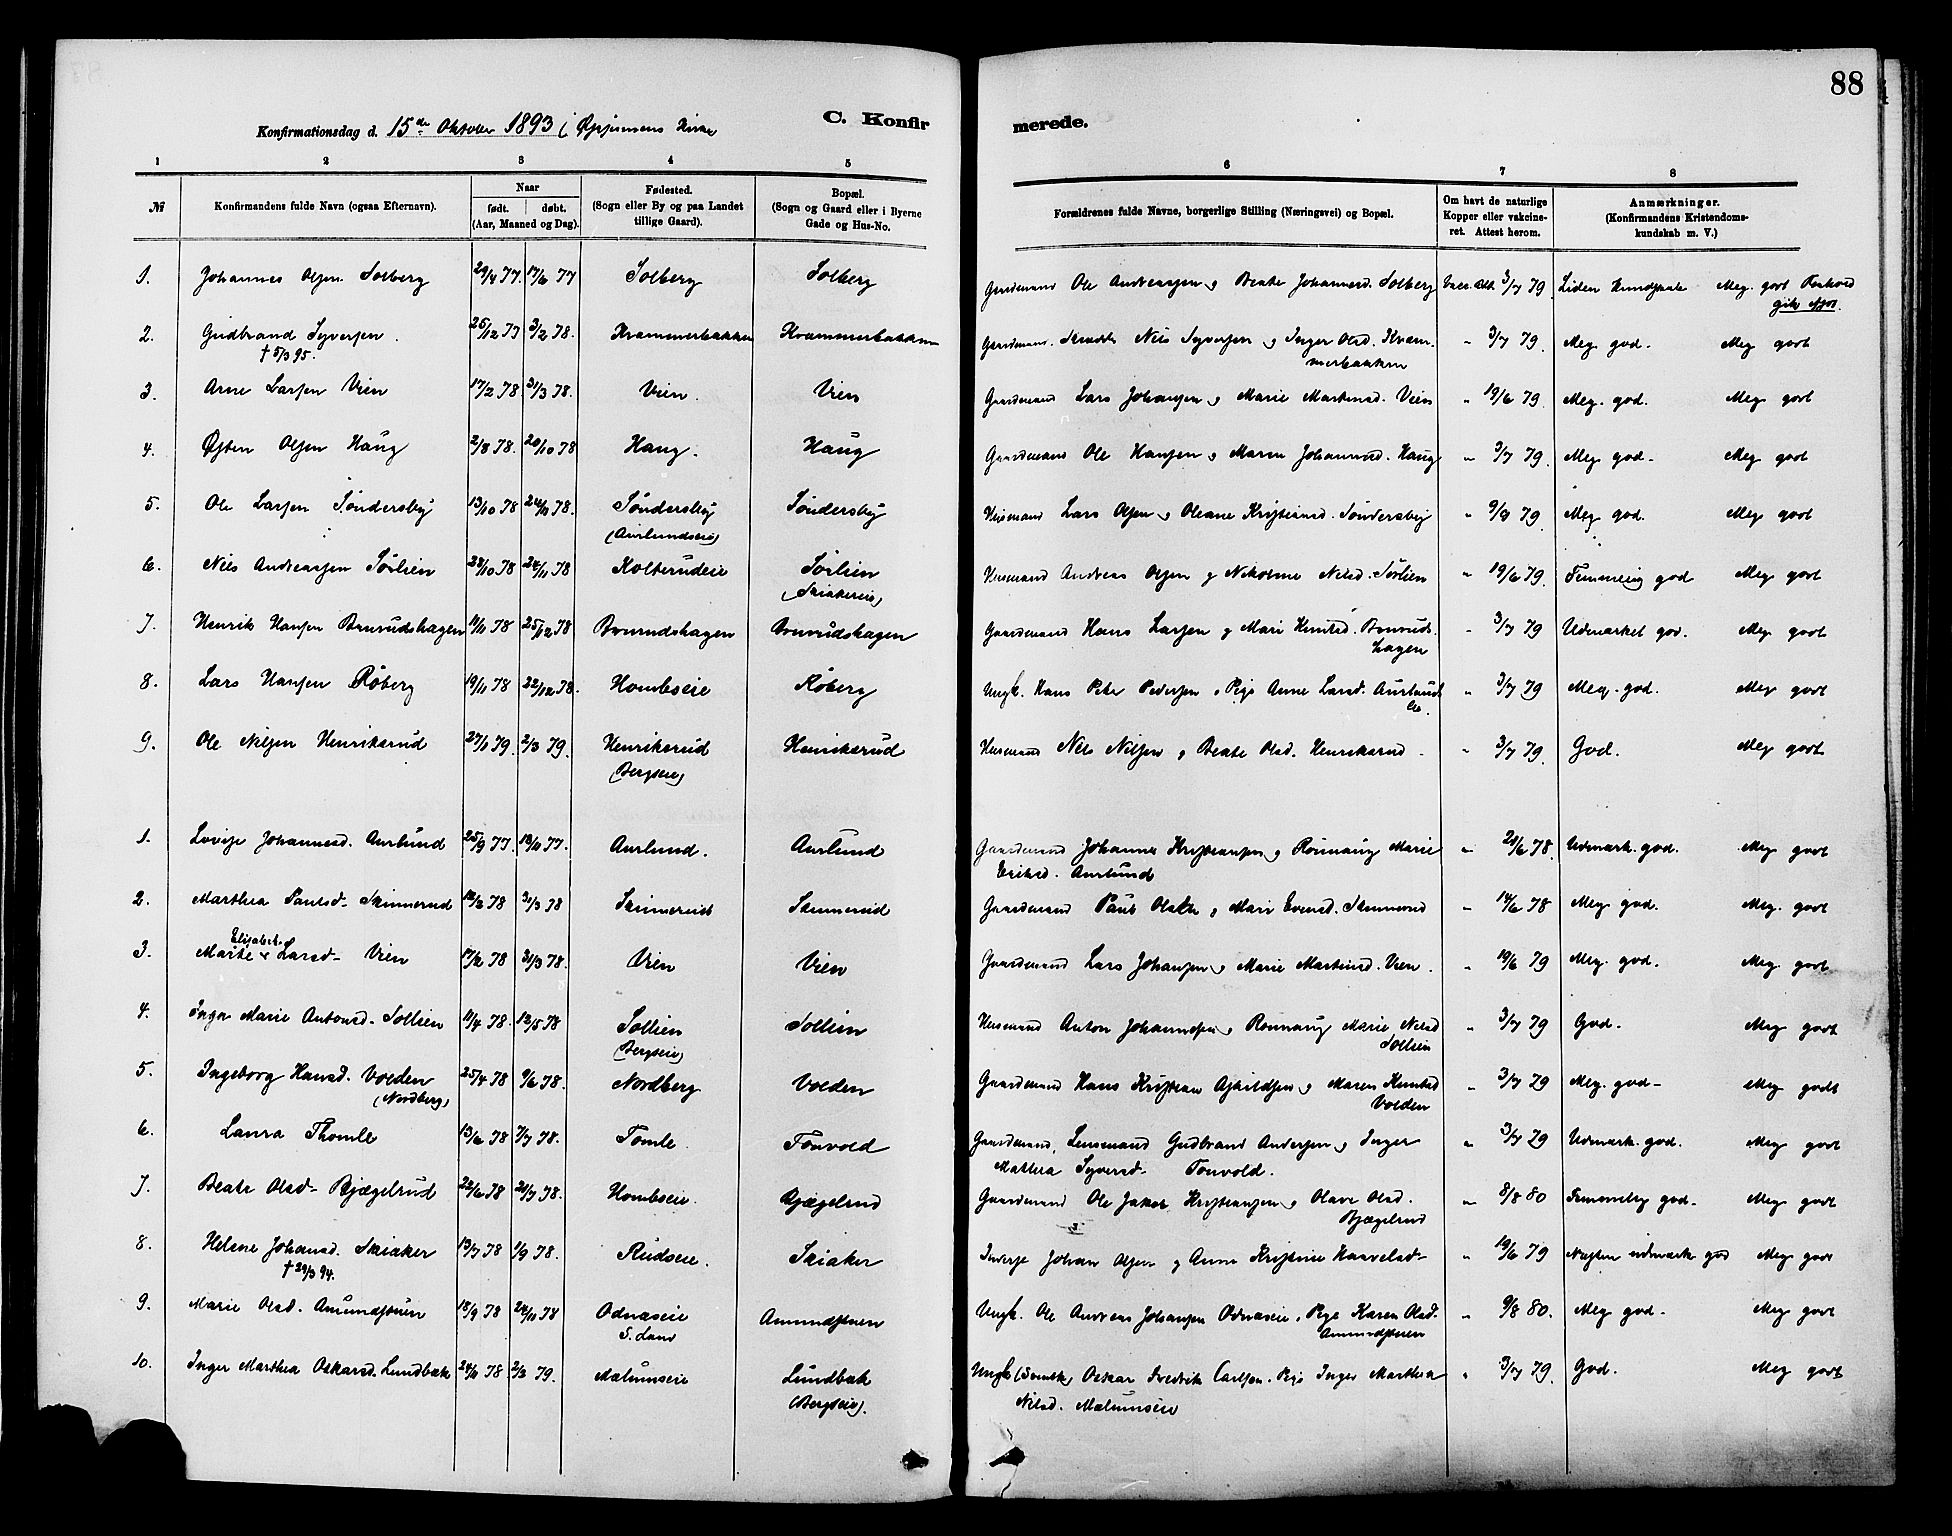 SAH, Nordre Land prestekontor, Ministerialbok nr. 3, 1882-1896, s. 88